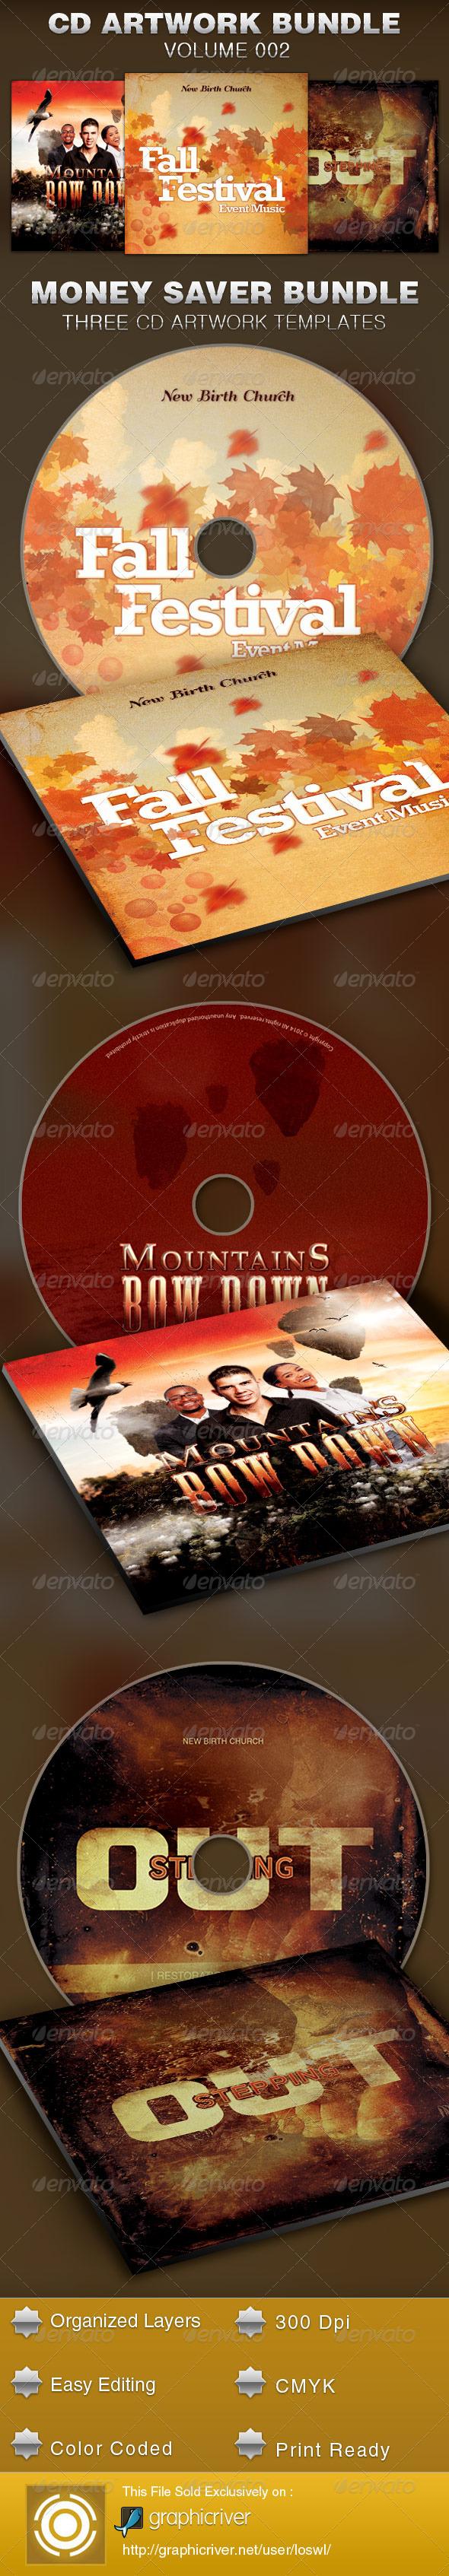 GraphicRiver CD Cover Artwork Bundle-Vol 002 5383864